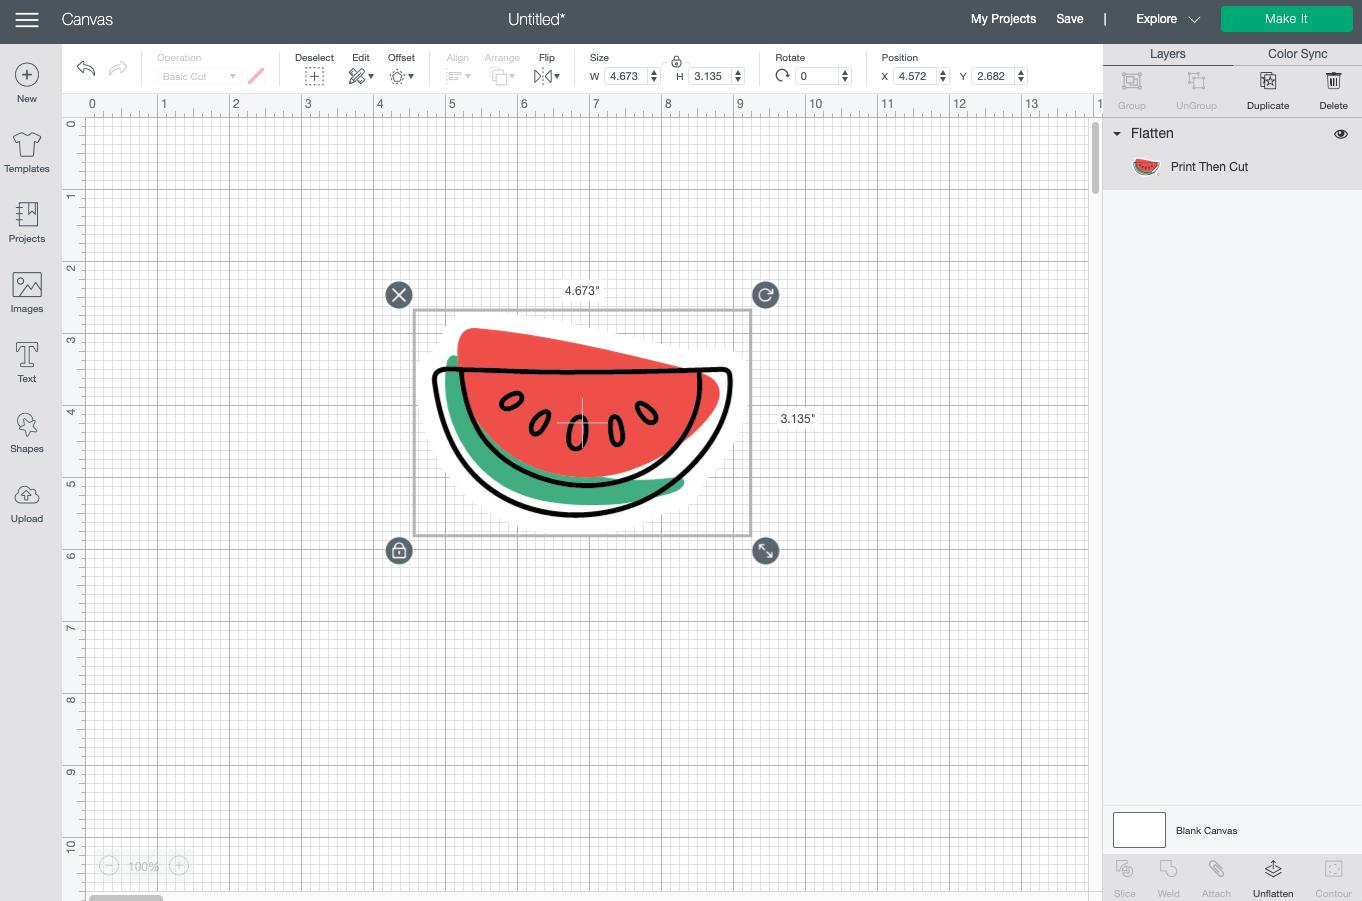 Cricut Design Space: flattening image into sticker